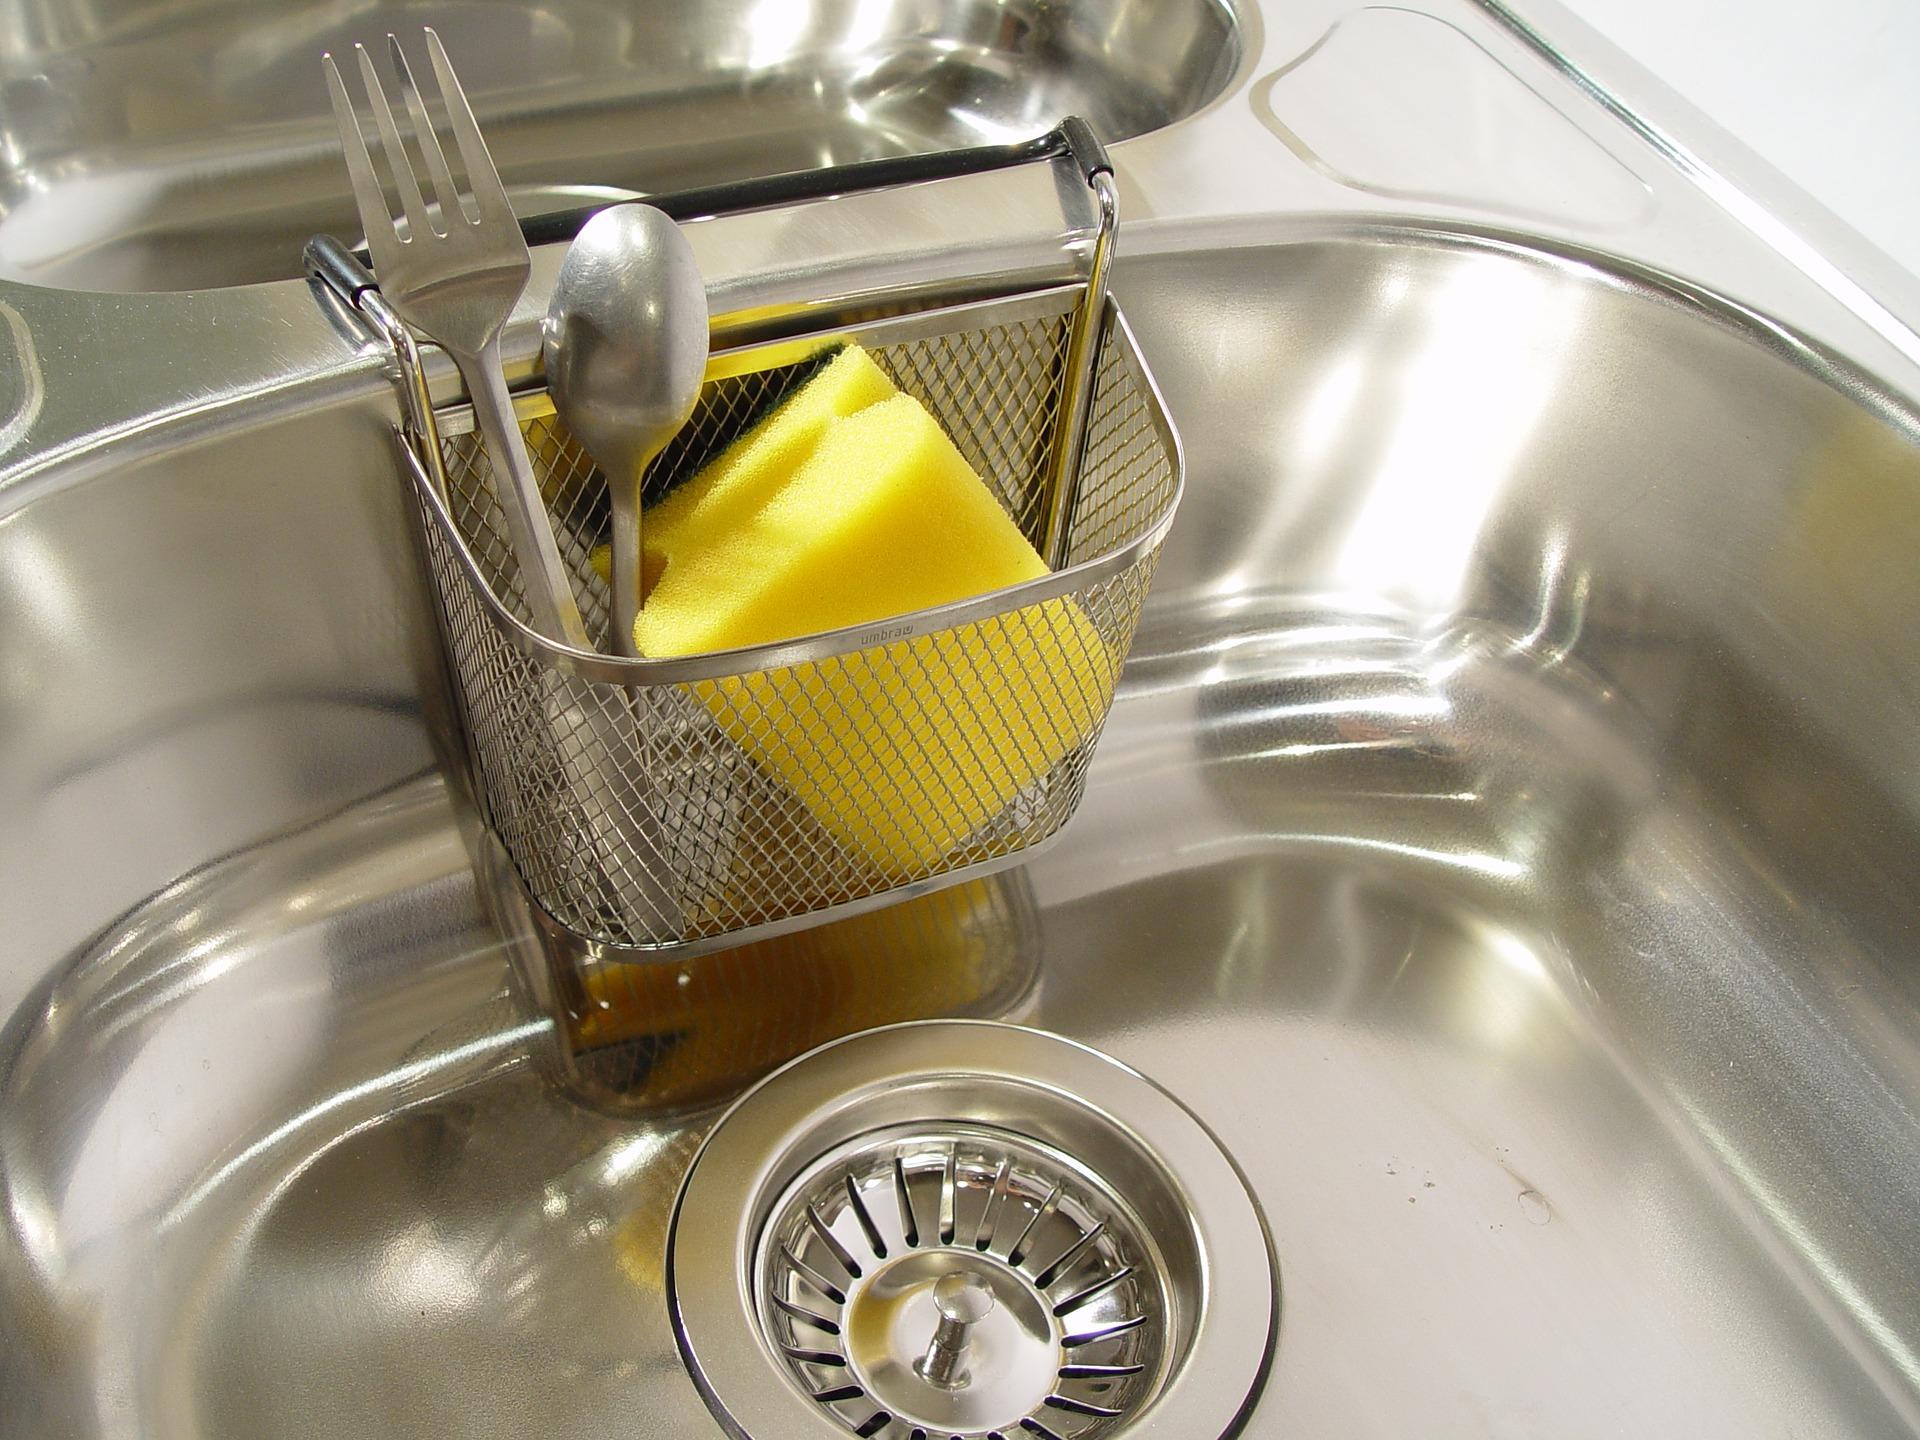 sink-1417457_1920.jpg